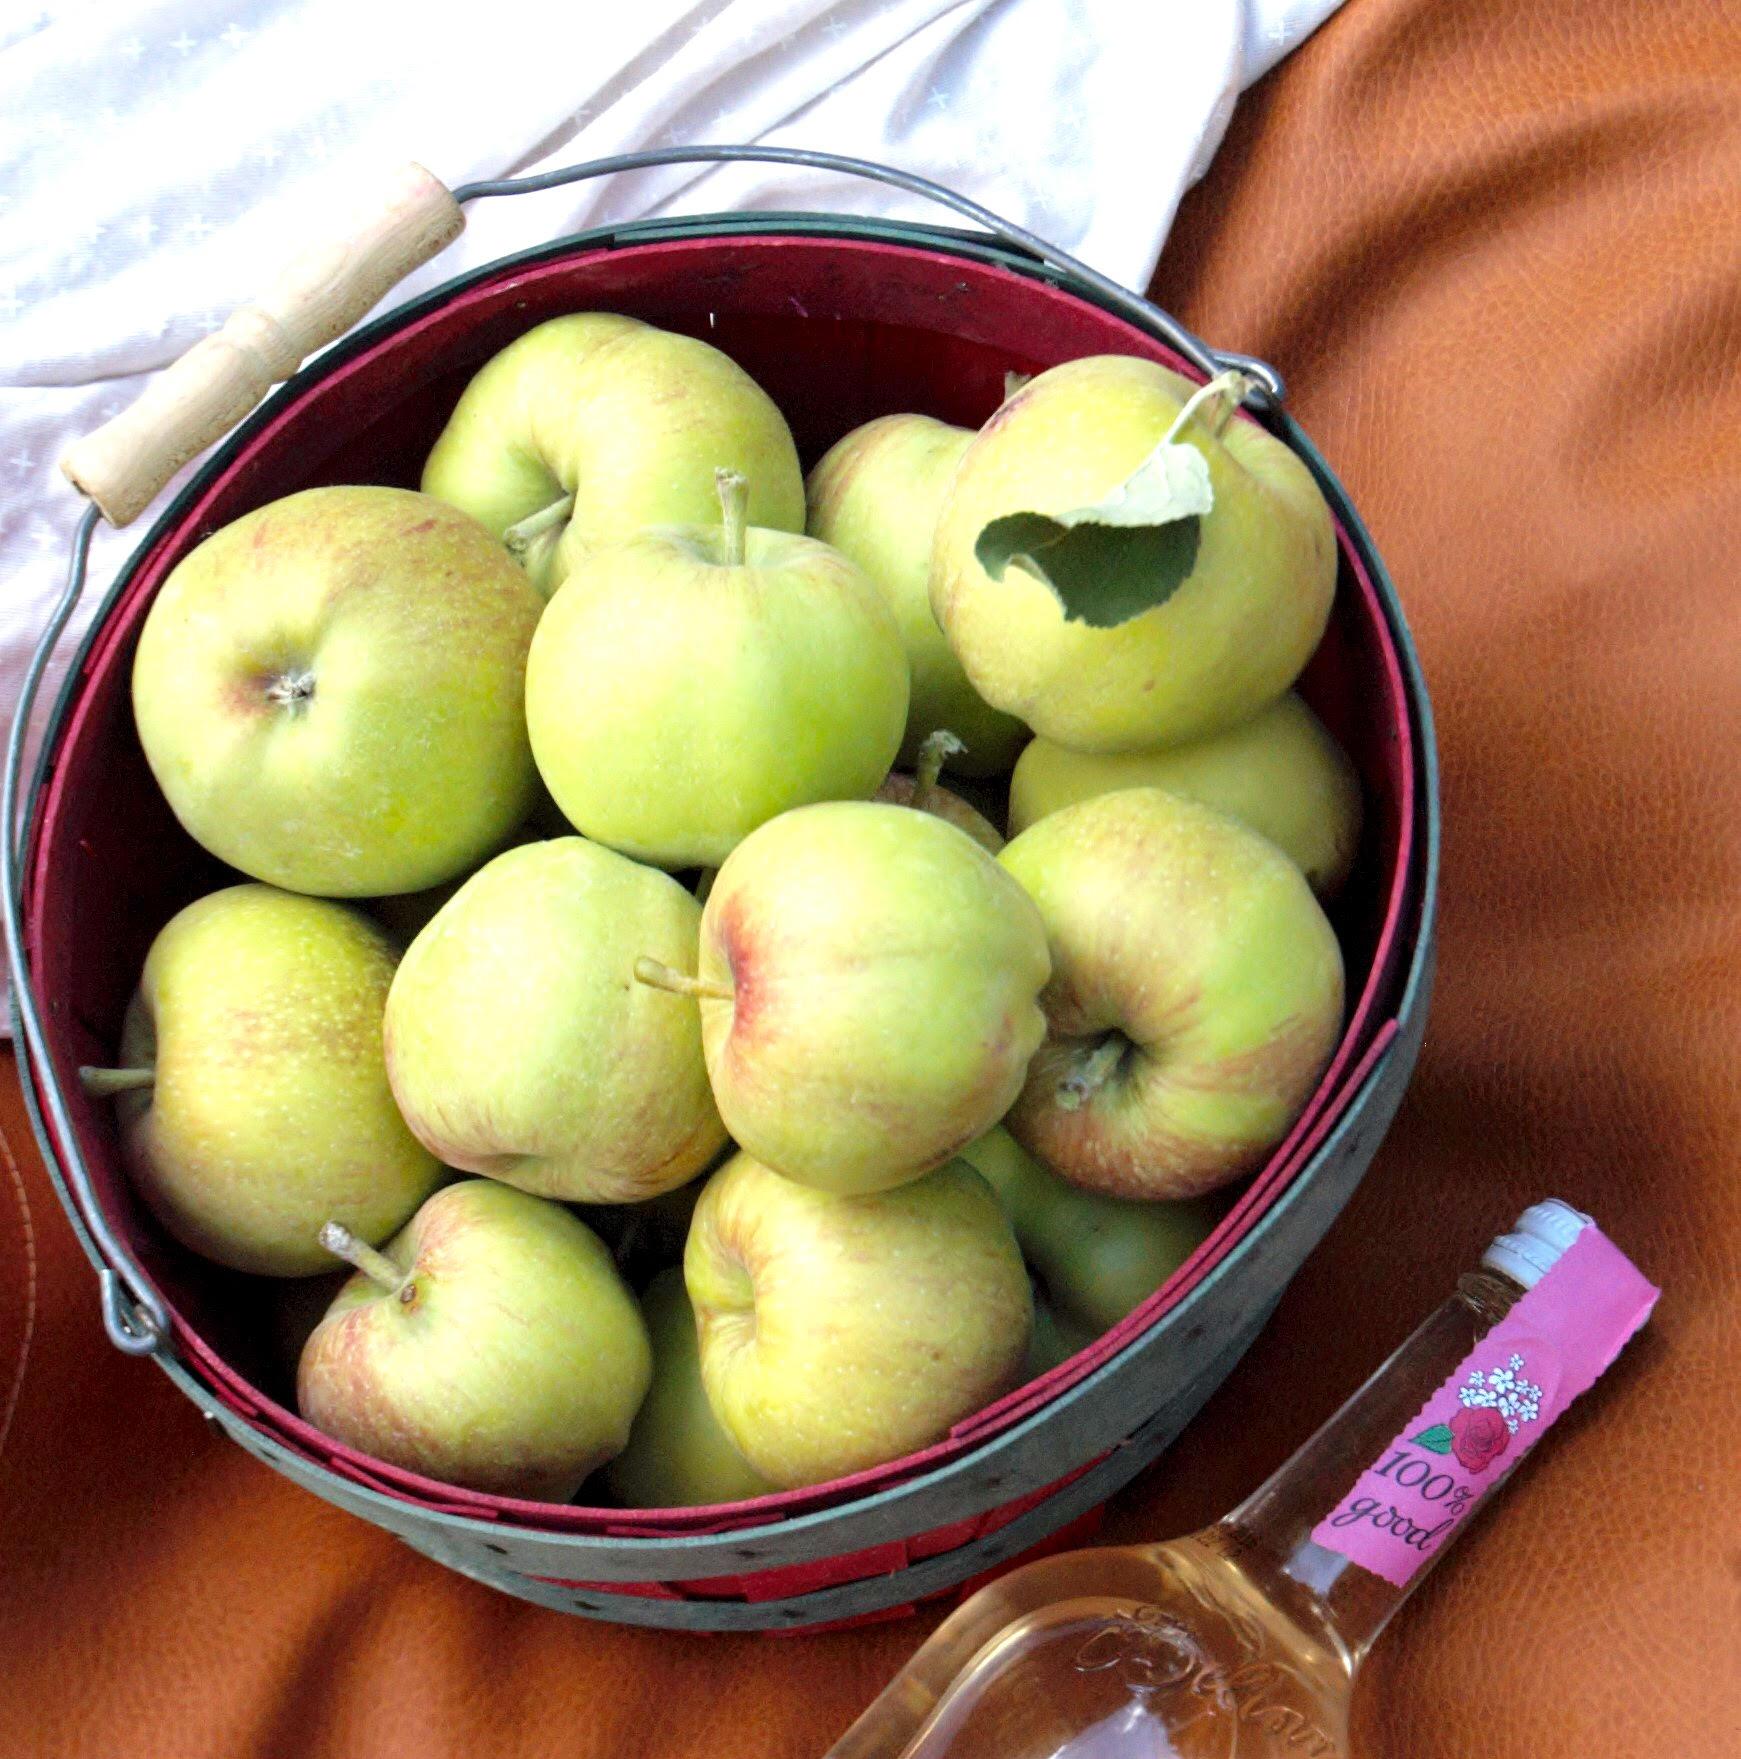 basket o apples.jpg